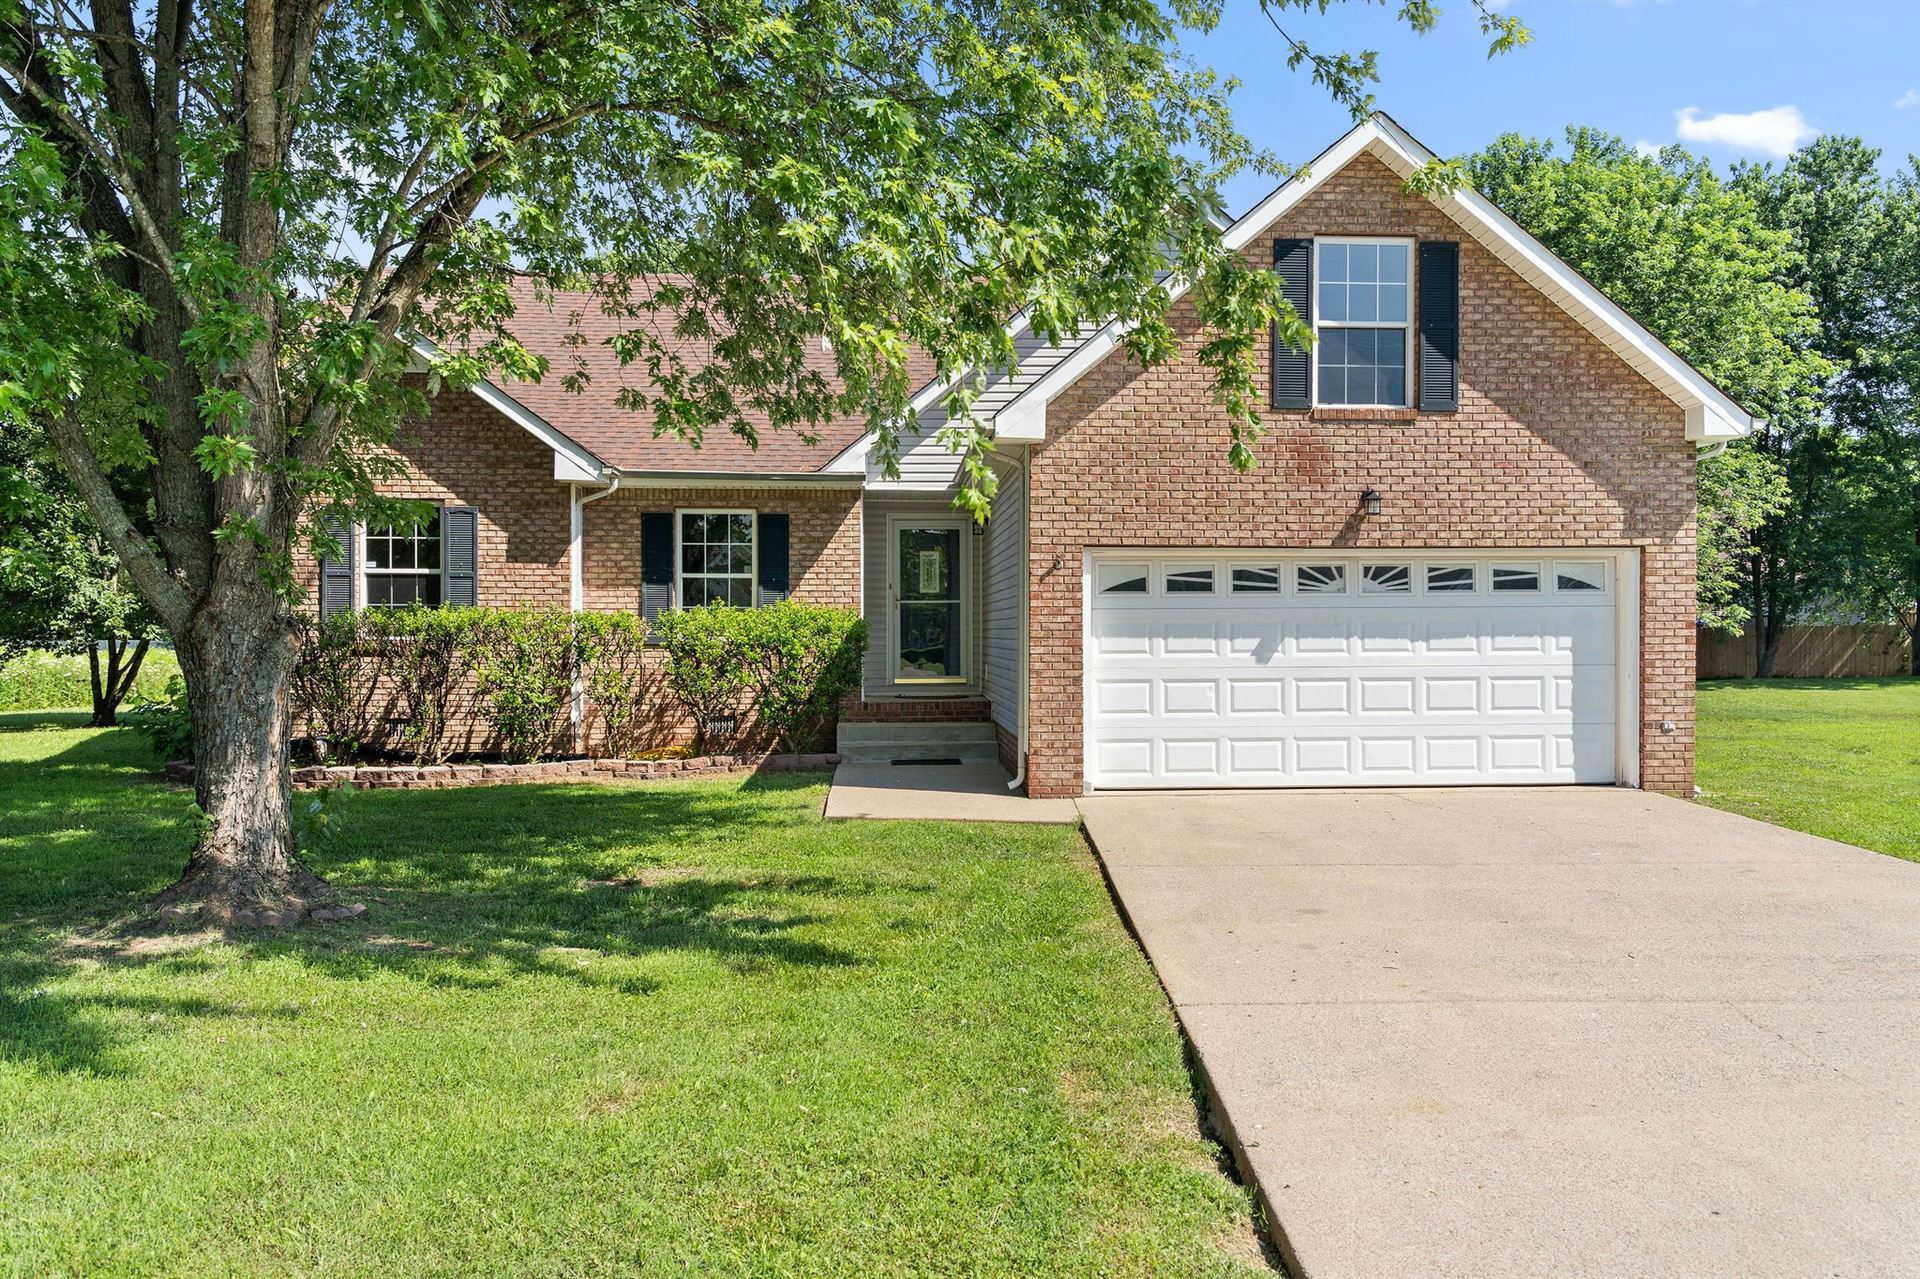 1177 Anthony Ct, Clarksville, TN 37040 - MLS#: 2258800